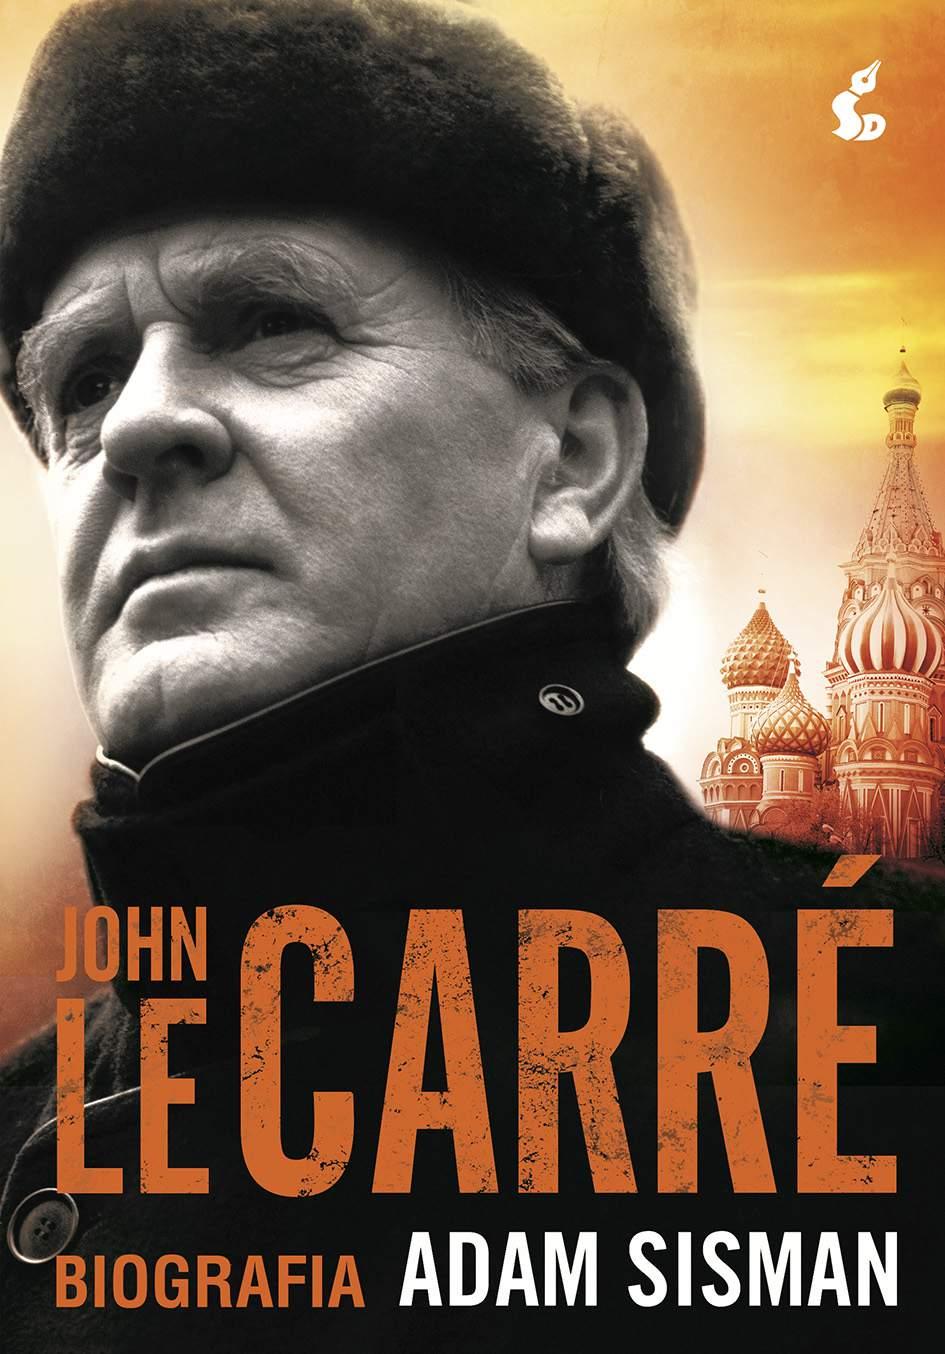 John le Carre. Biografia - Ebook (Książka EPUB) do pobrania w formacie EPUB